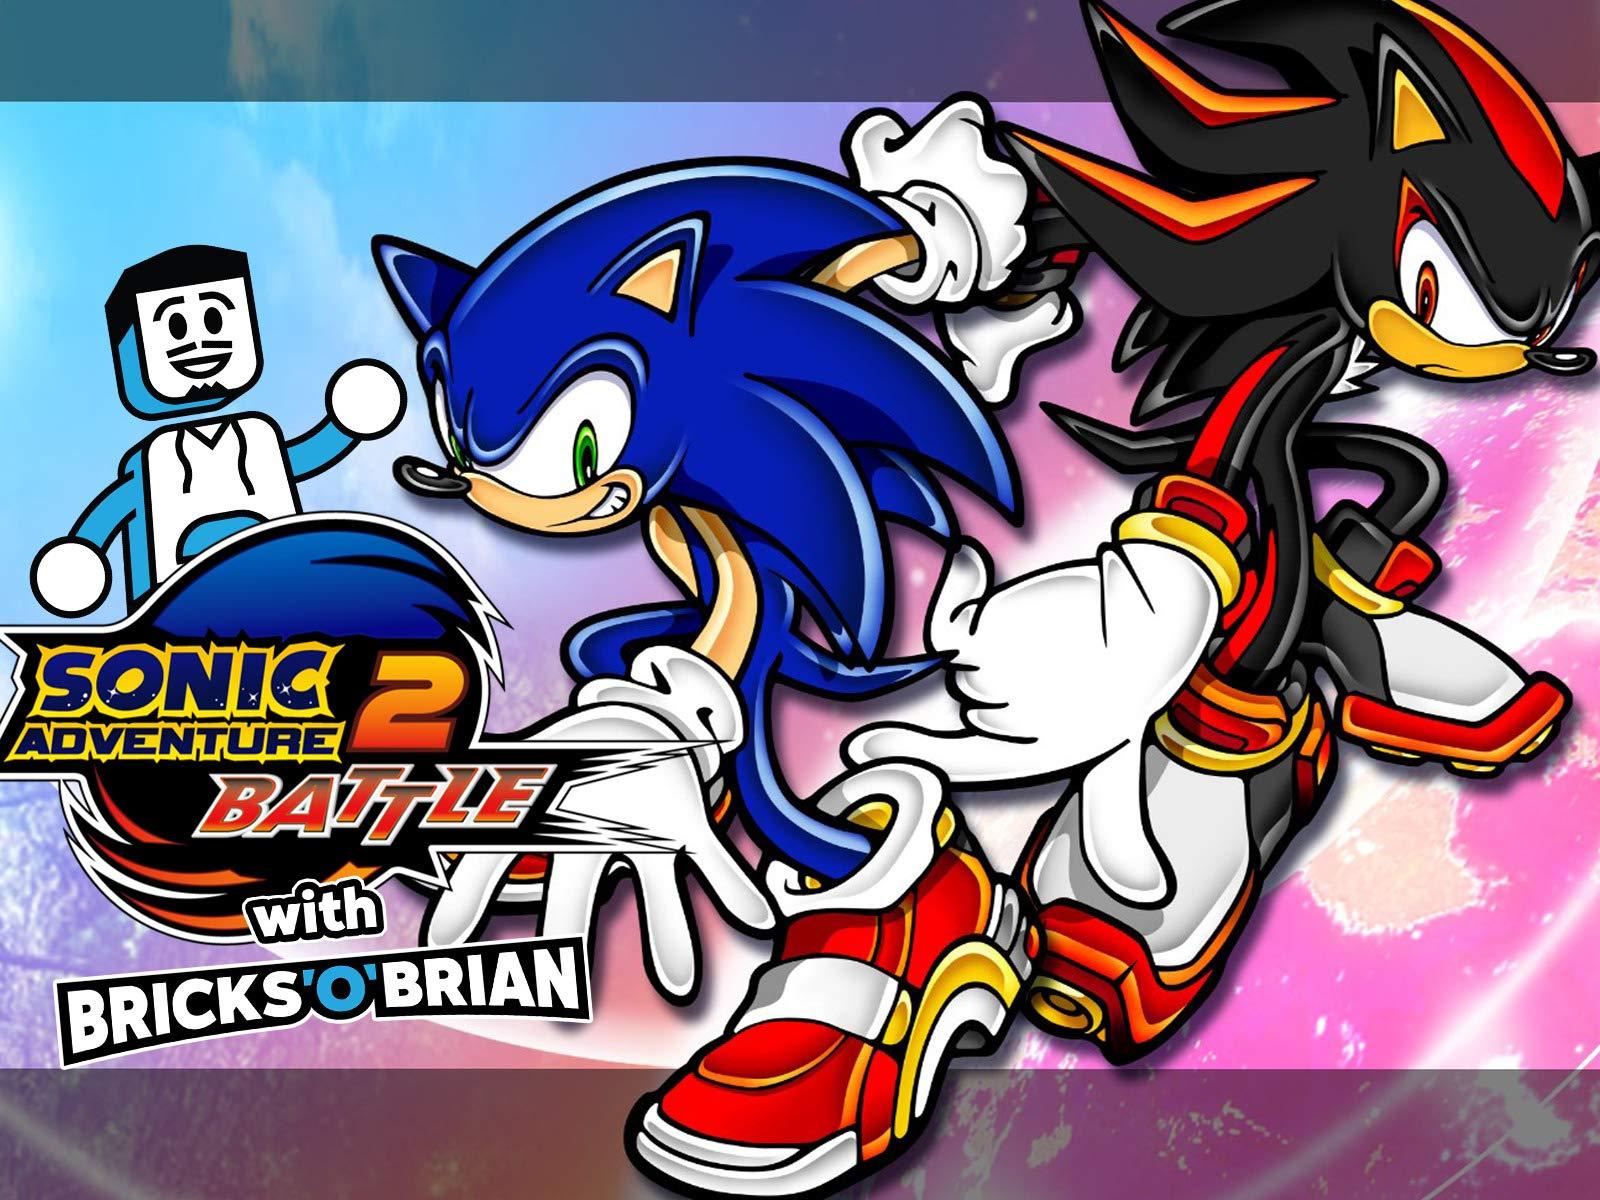 Clip: Sonic Adventure 2 Battle with Bricks 'O' Brian! on Amazon Prime Video UK